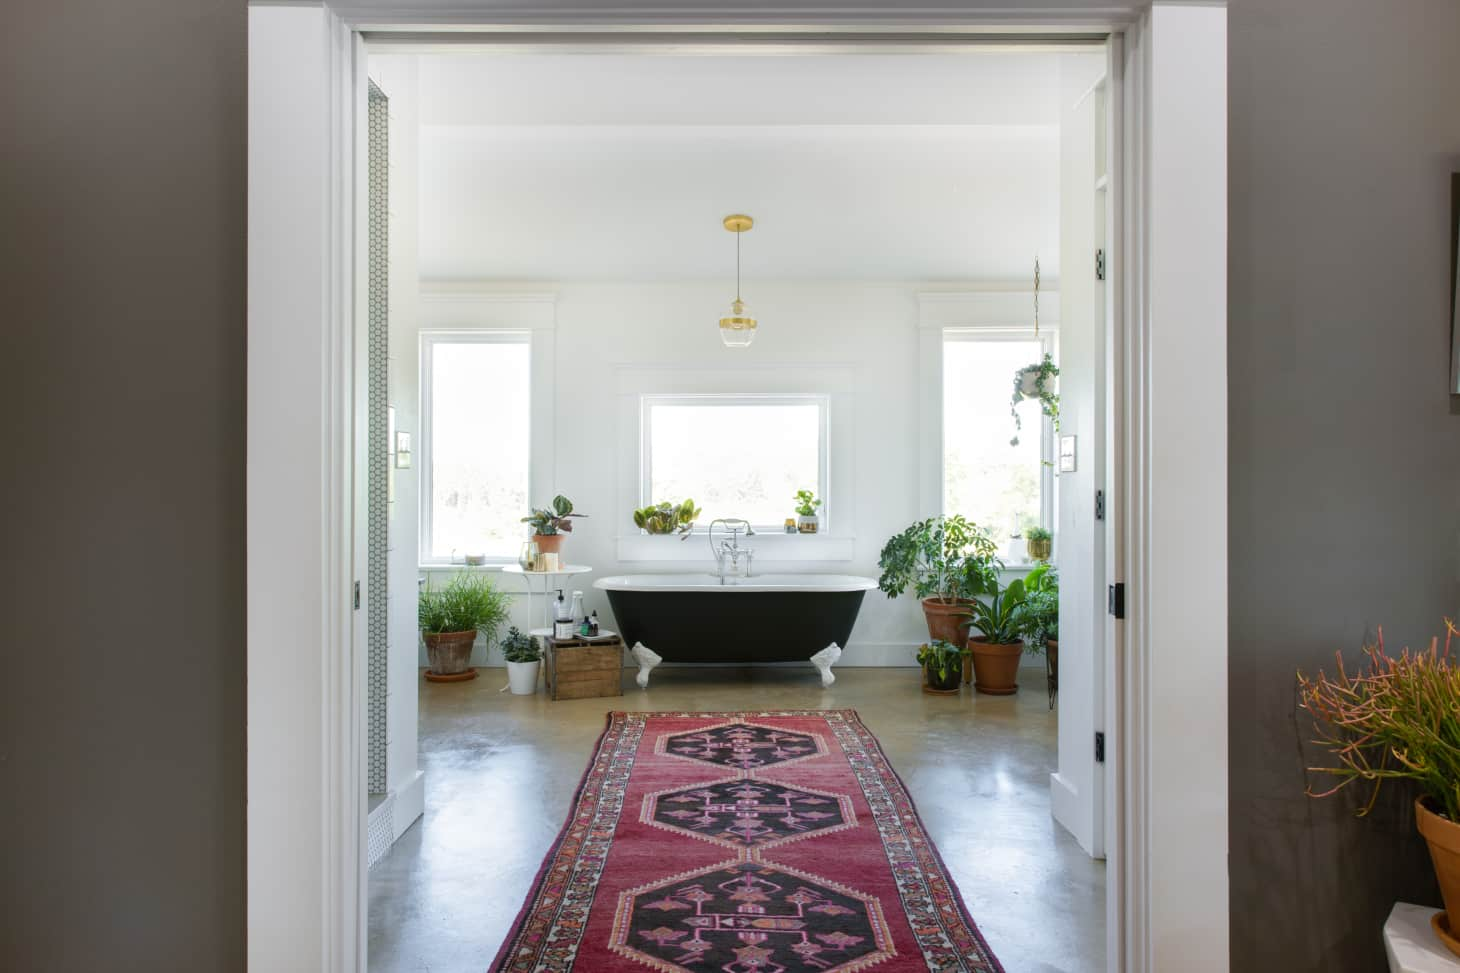 50 Best Bathroom Design Ideas   Apartment Therapy on Apartment Bathroom Ideas  id=64961